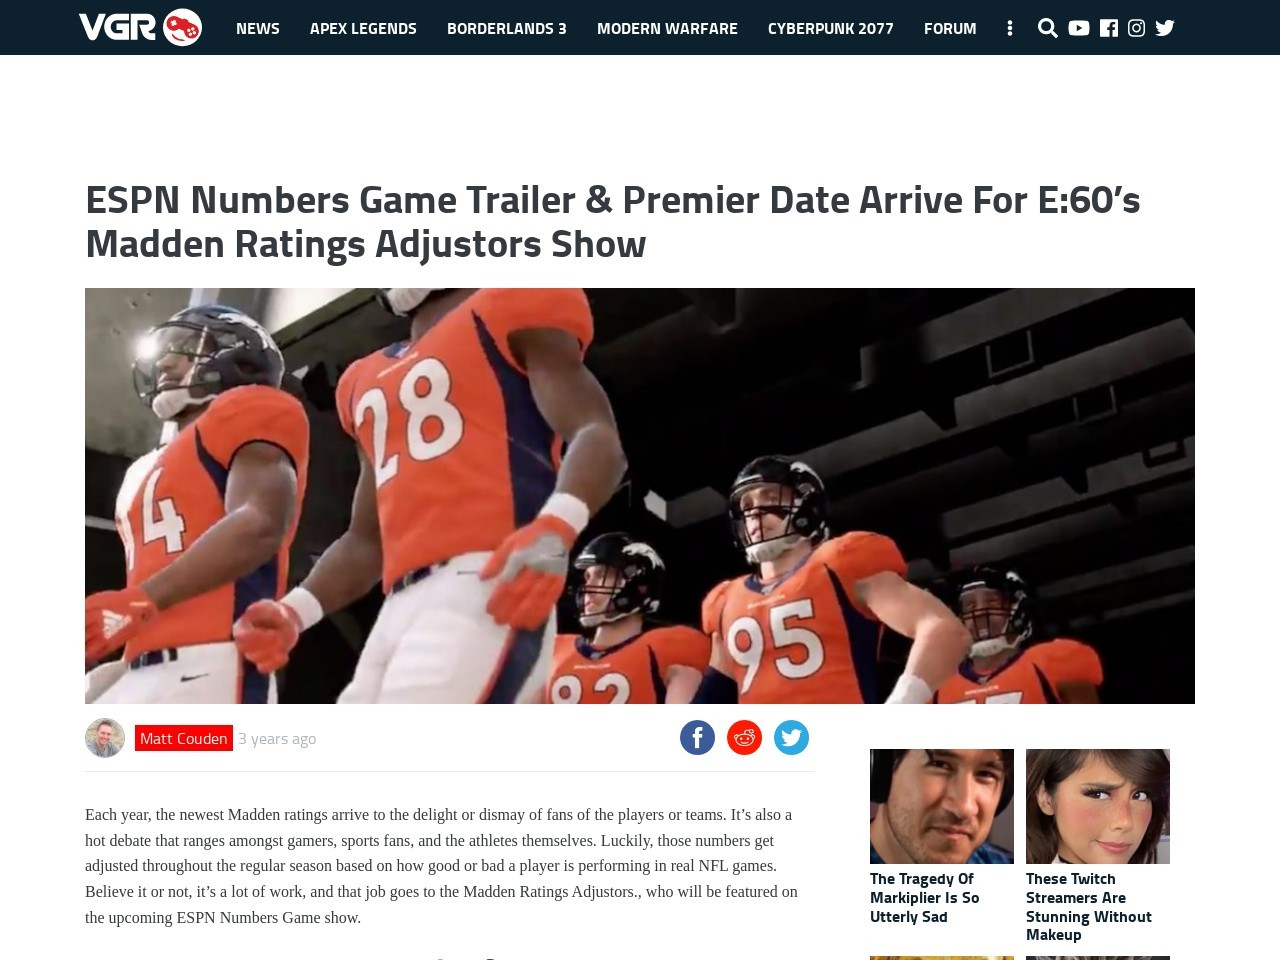 ESPN Numbers Game Trailer & Premier Date Arrive For E:60's Madden Ratings Adjustors Show